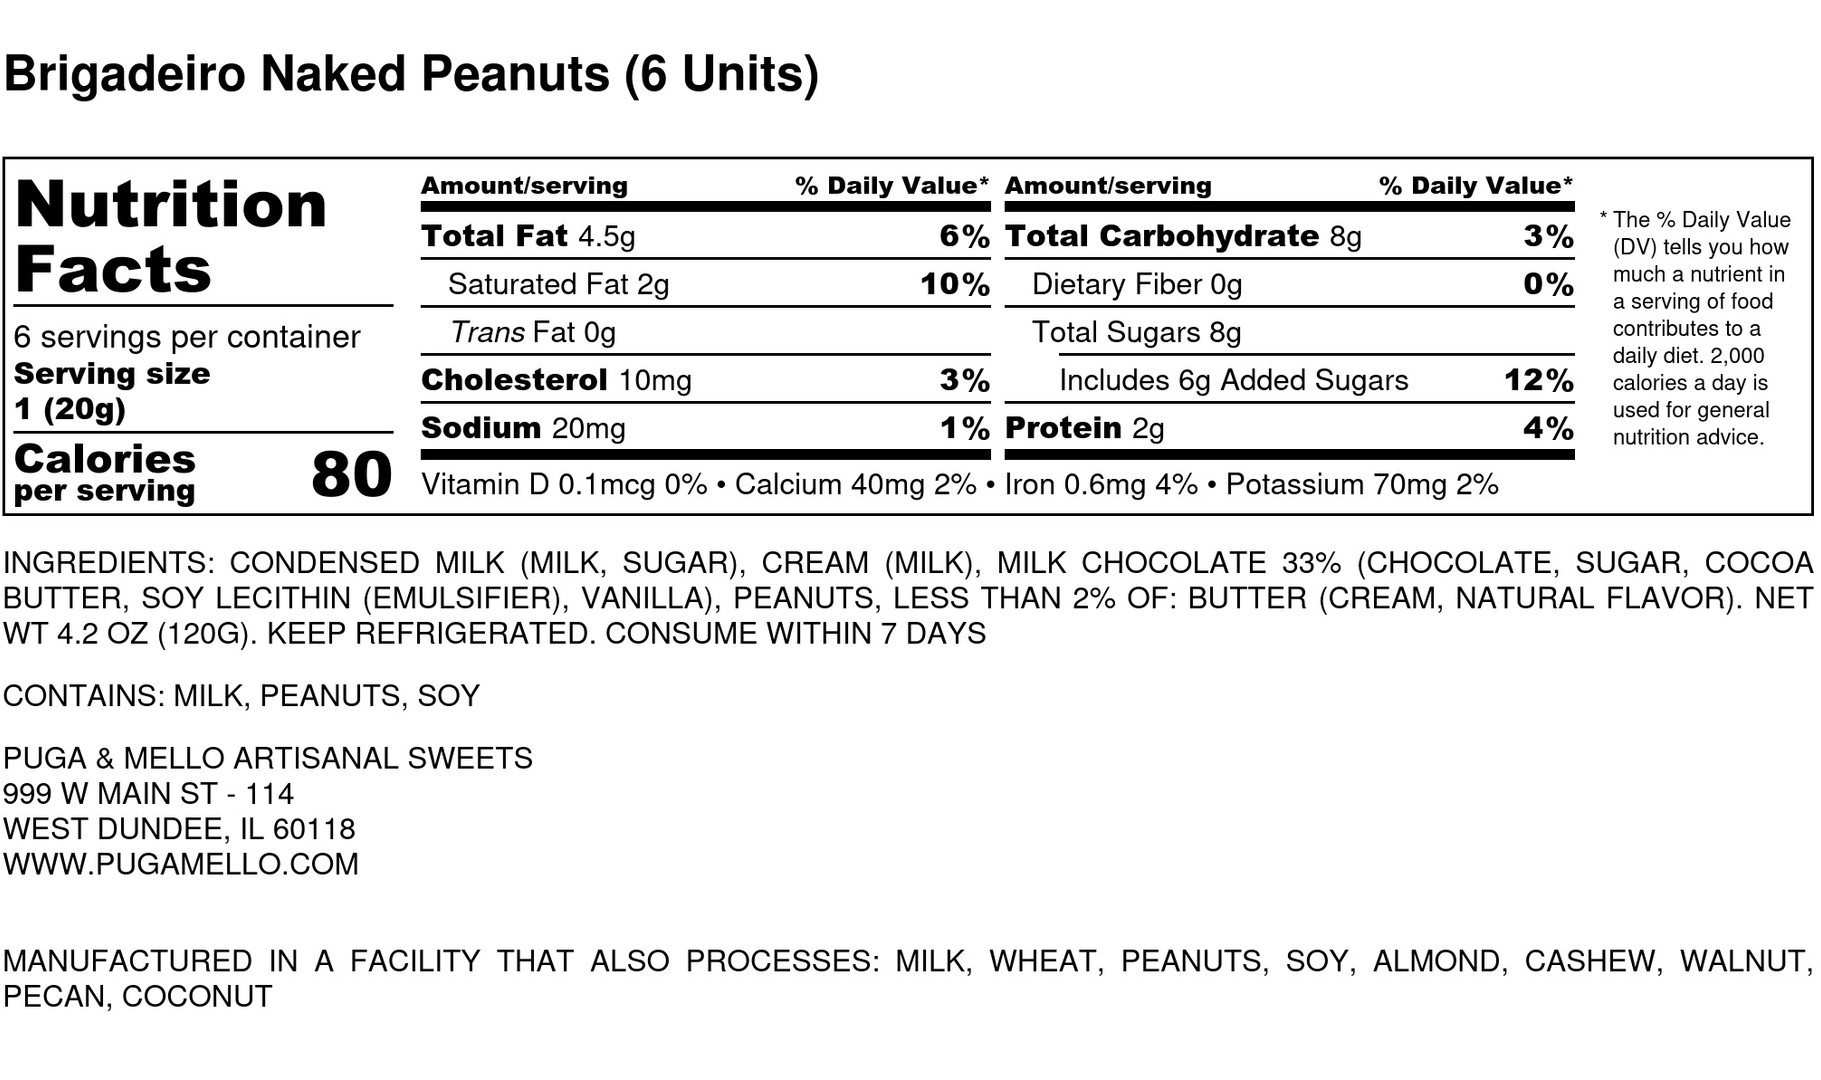 Brigadeiro Naked Peanuts (6 Units) - Nut